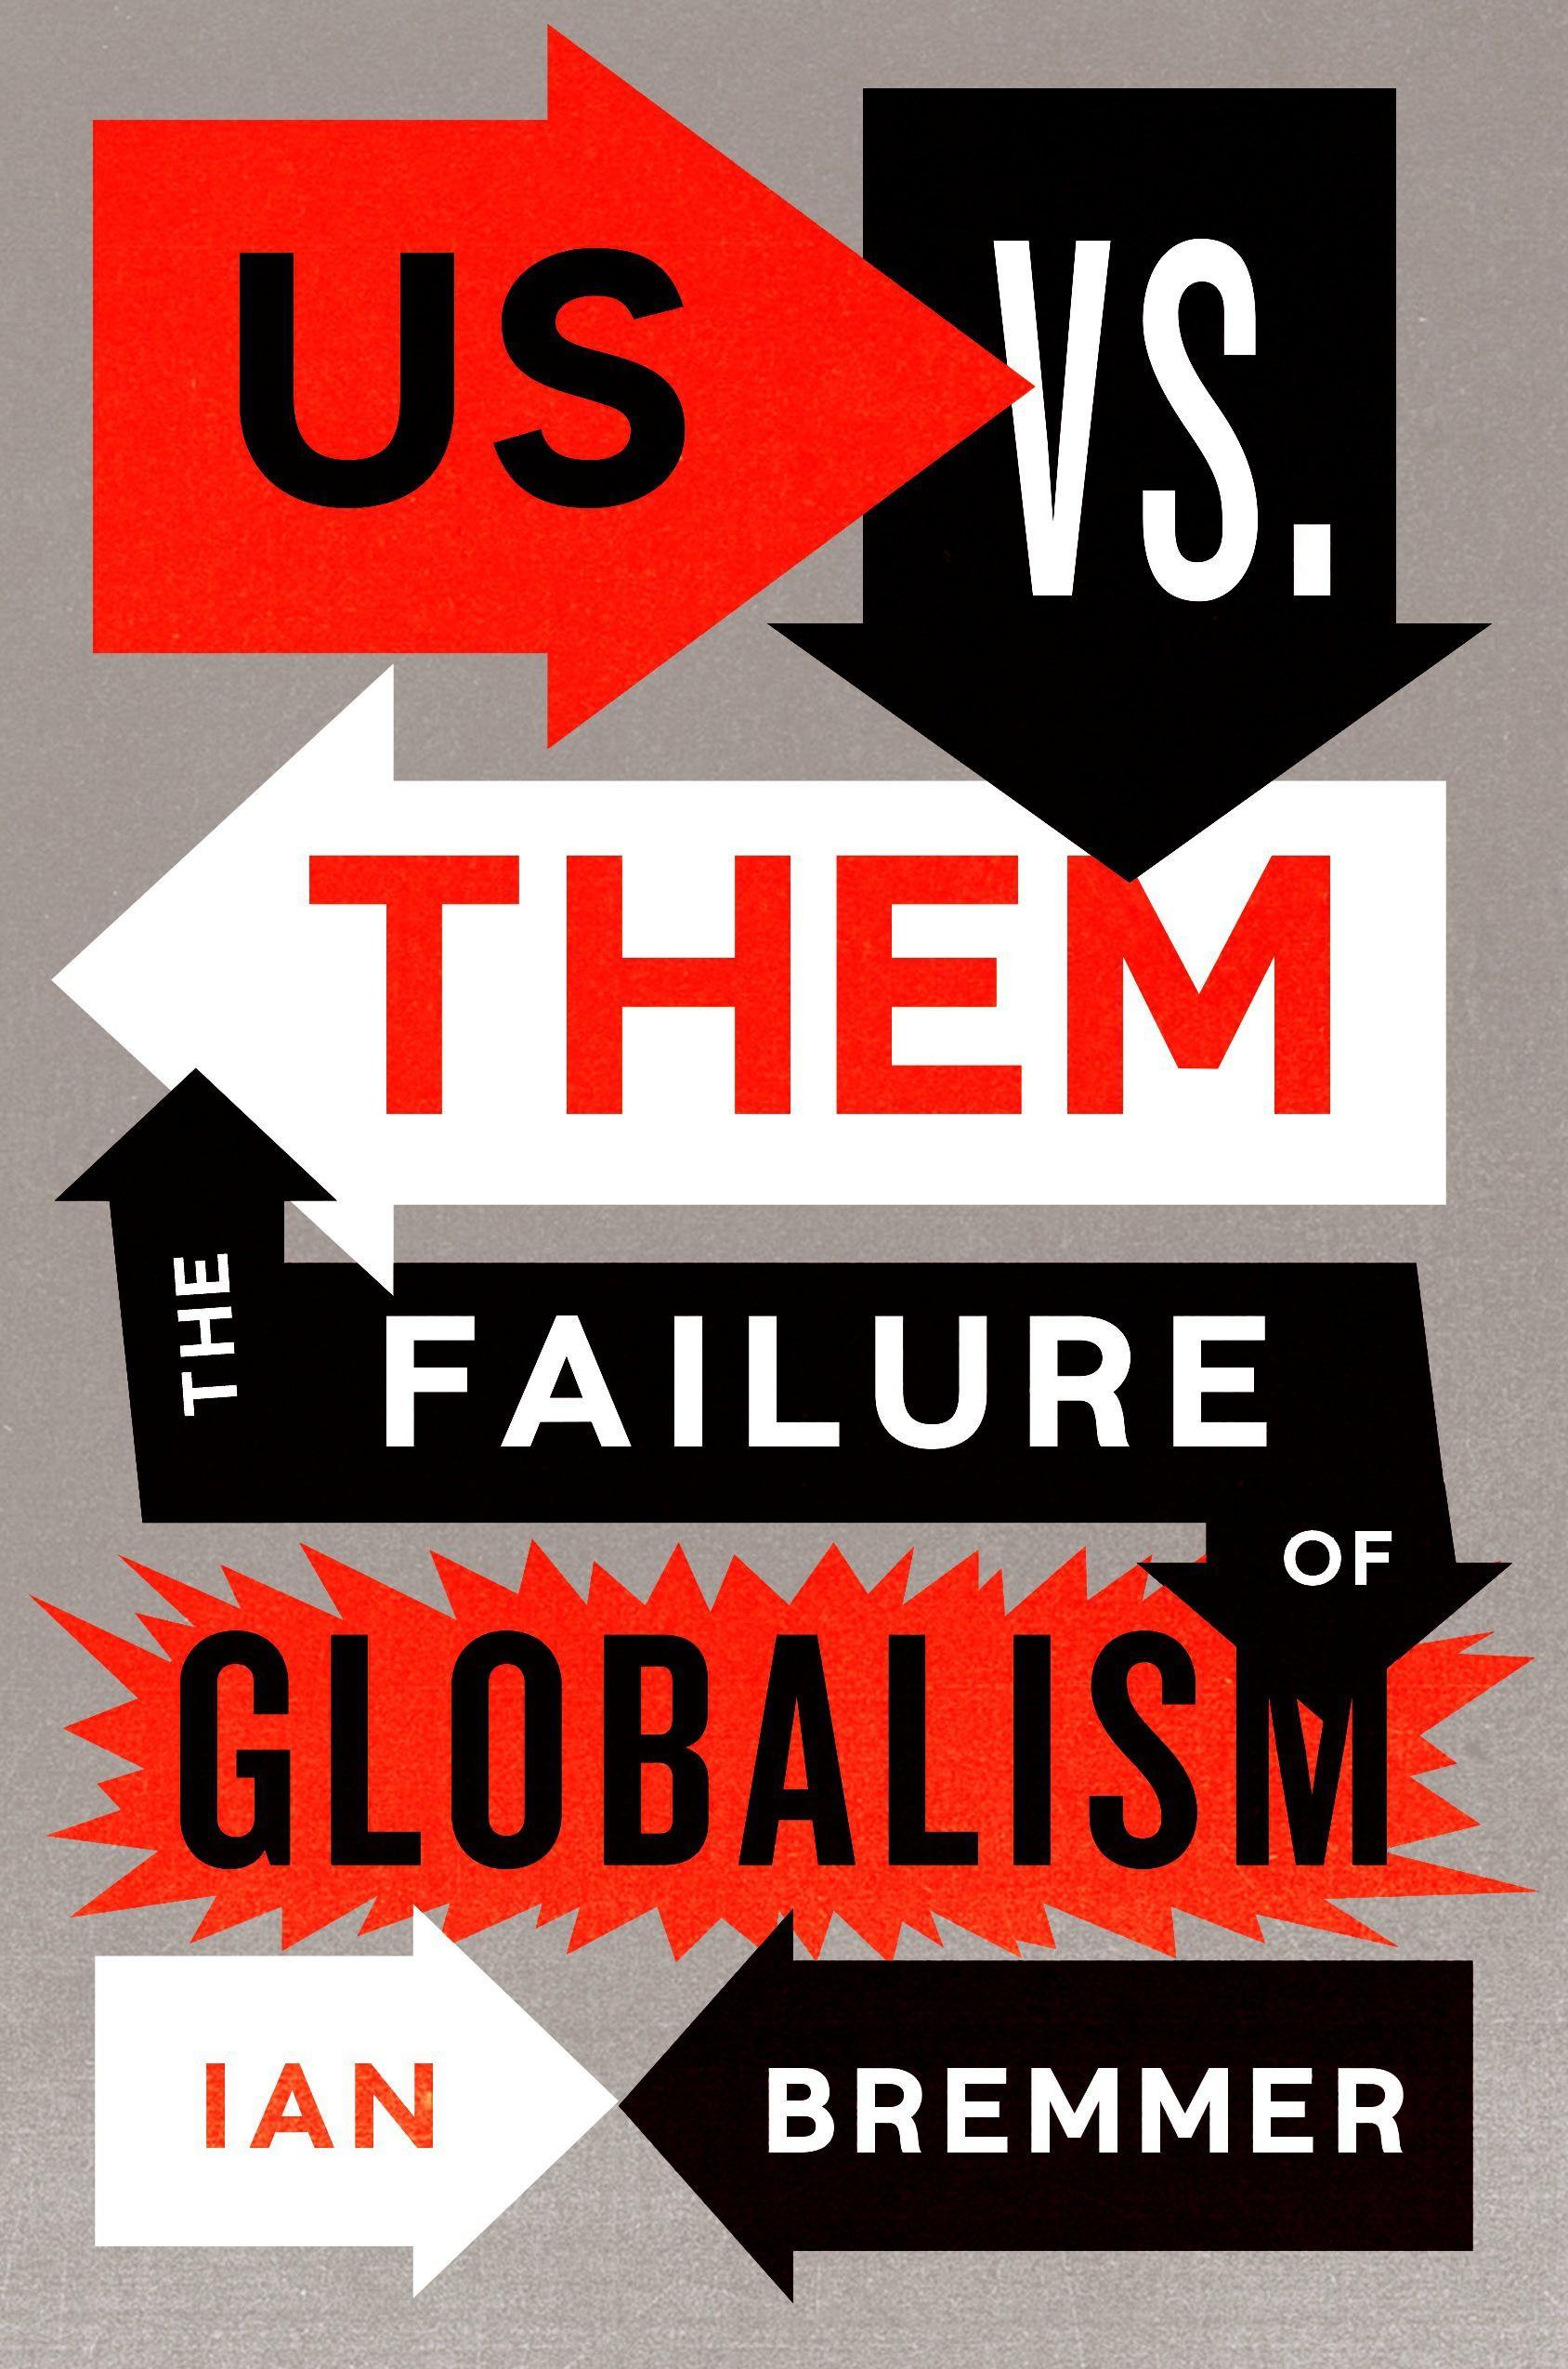 Ian Bremmer's new book